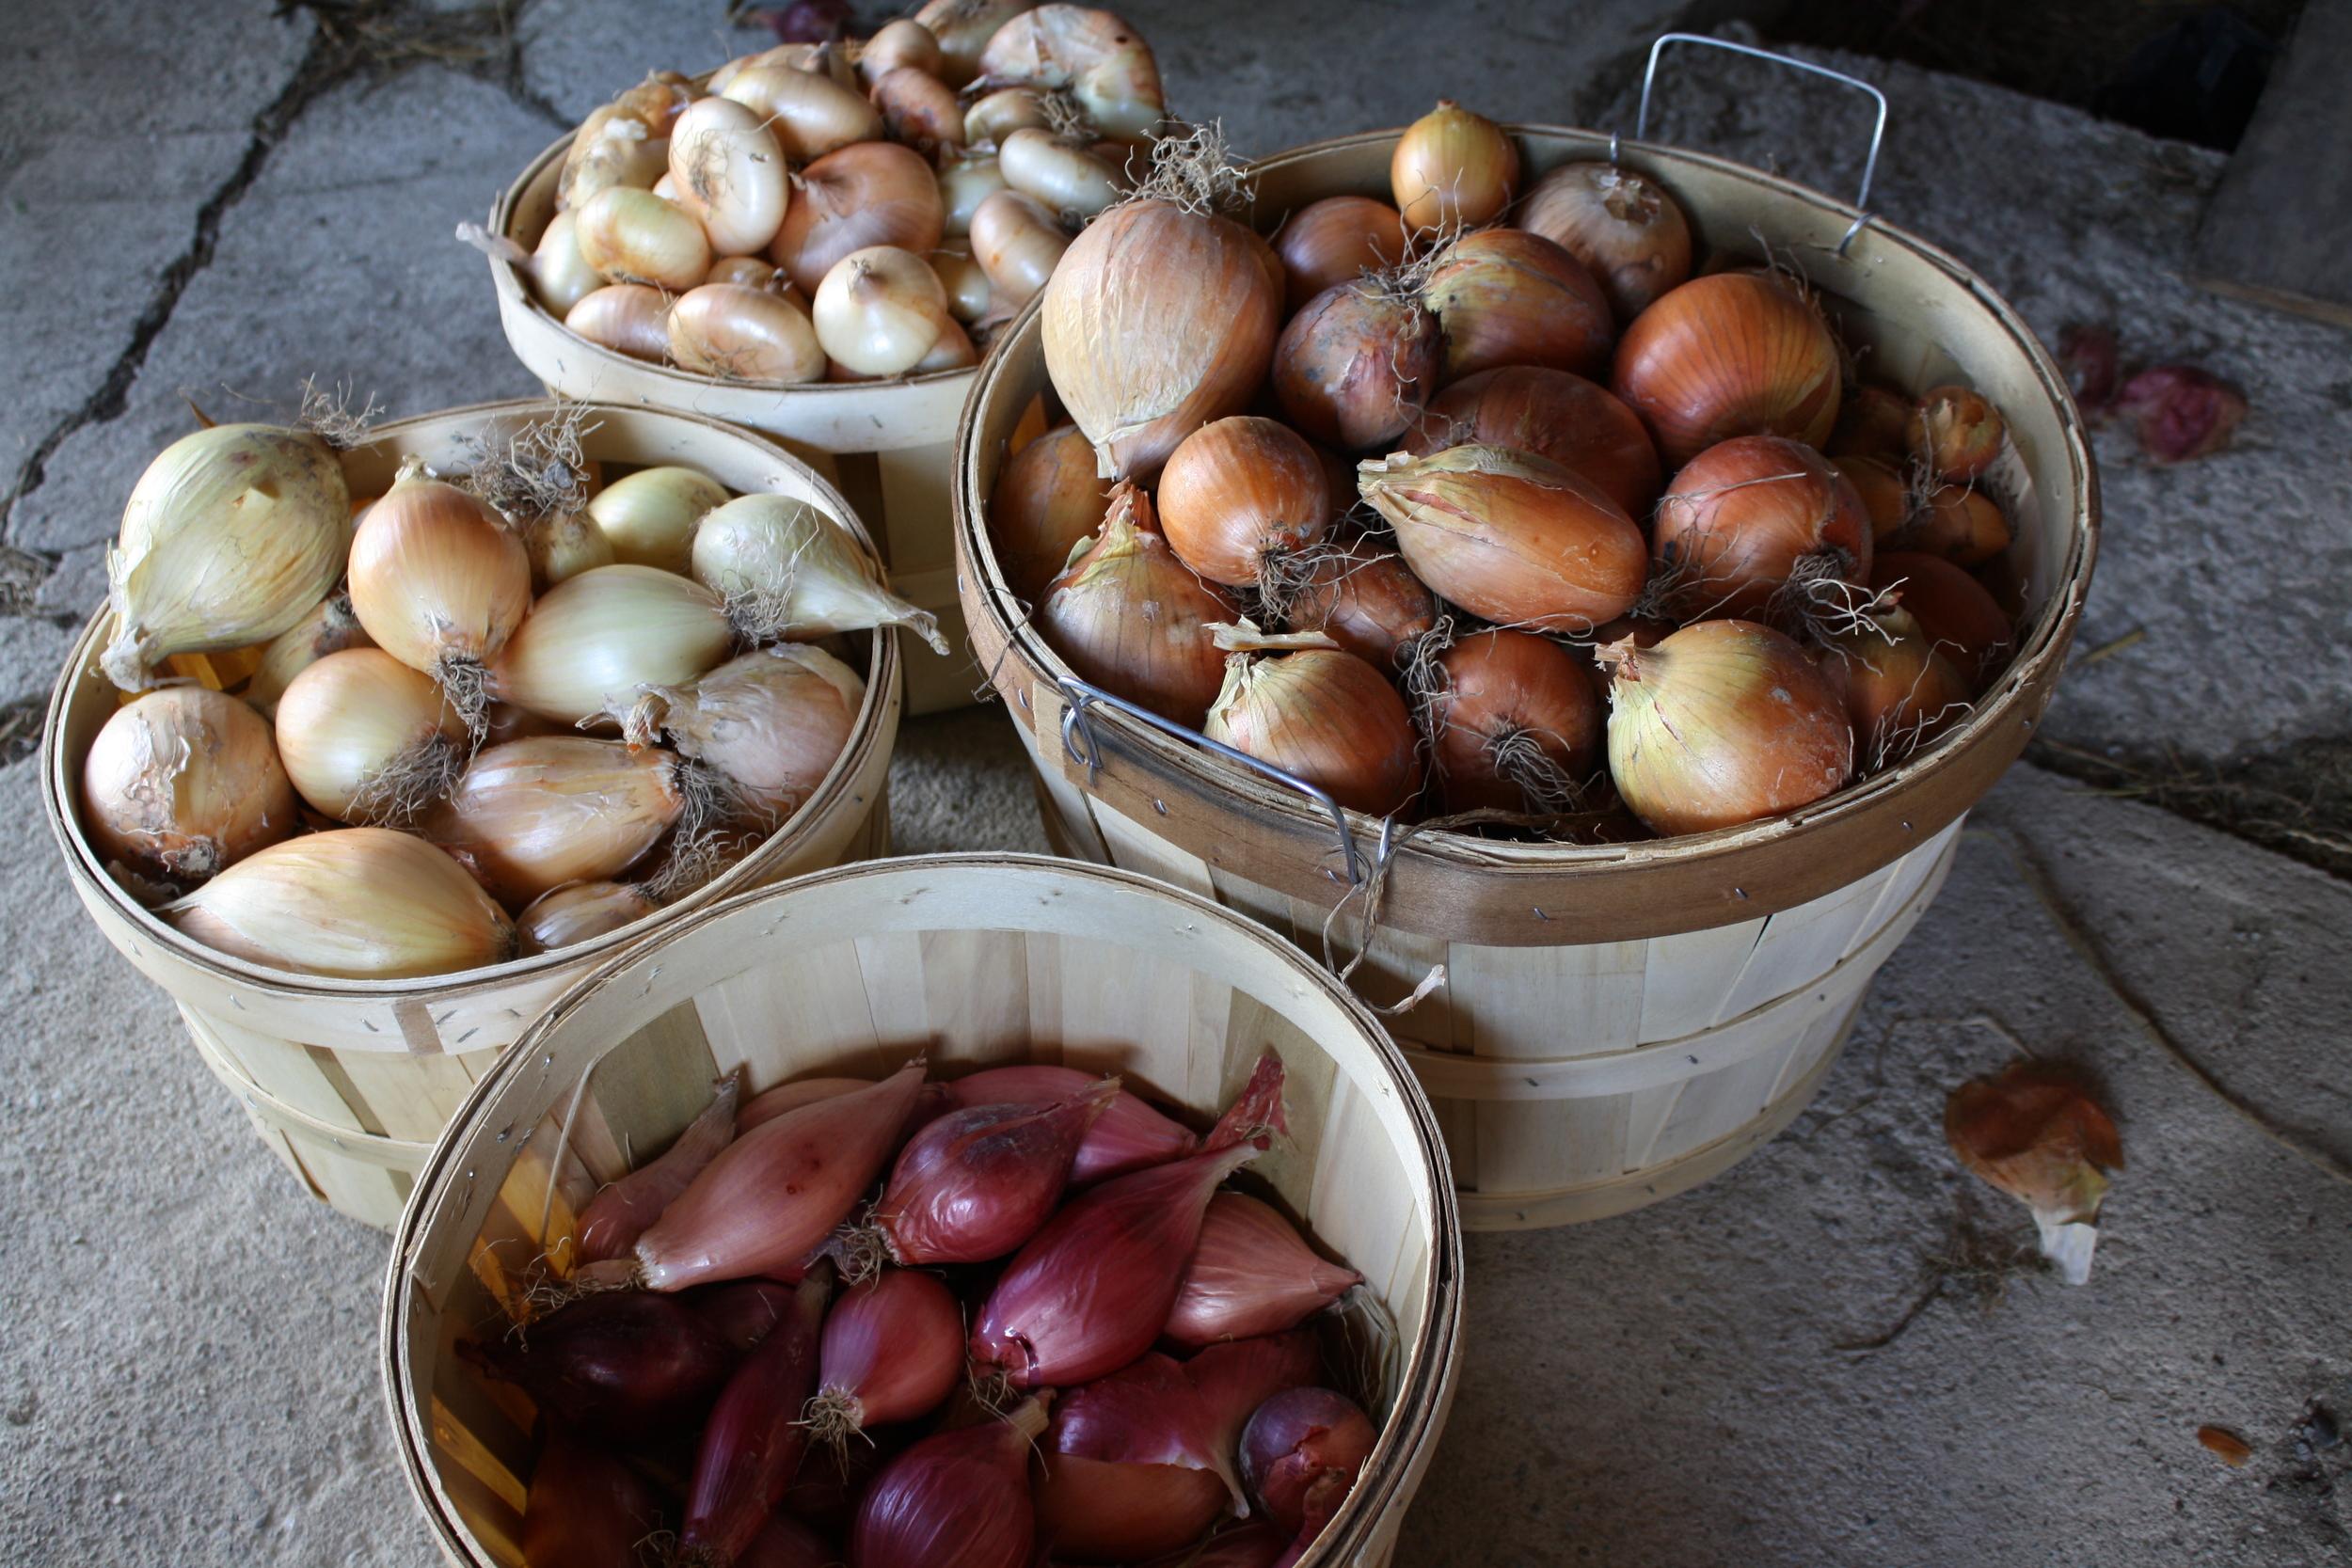 'Gold Coin', 'Alisa Craig', 'Pontiac', and 'Rossa Lunga di Tropea' onions